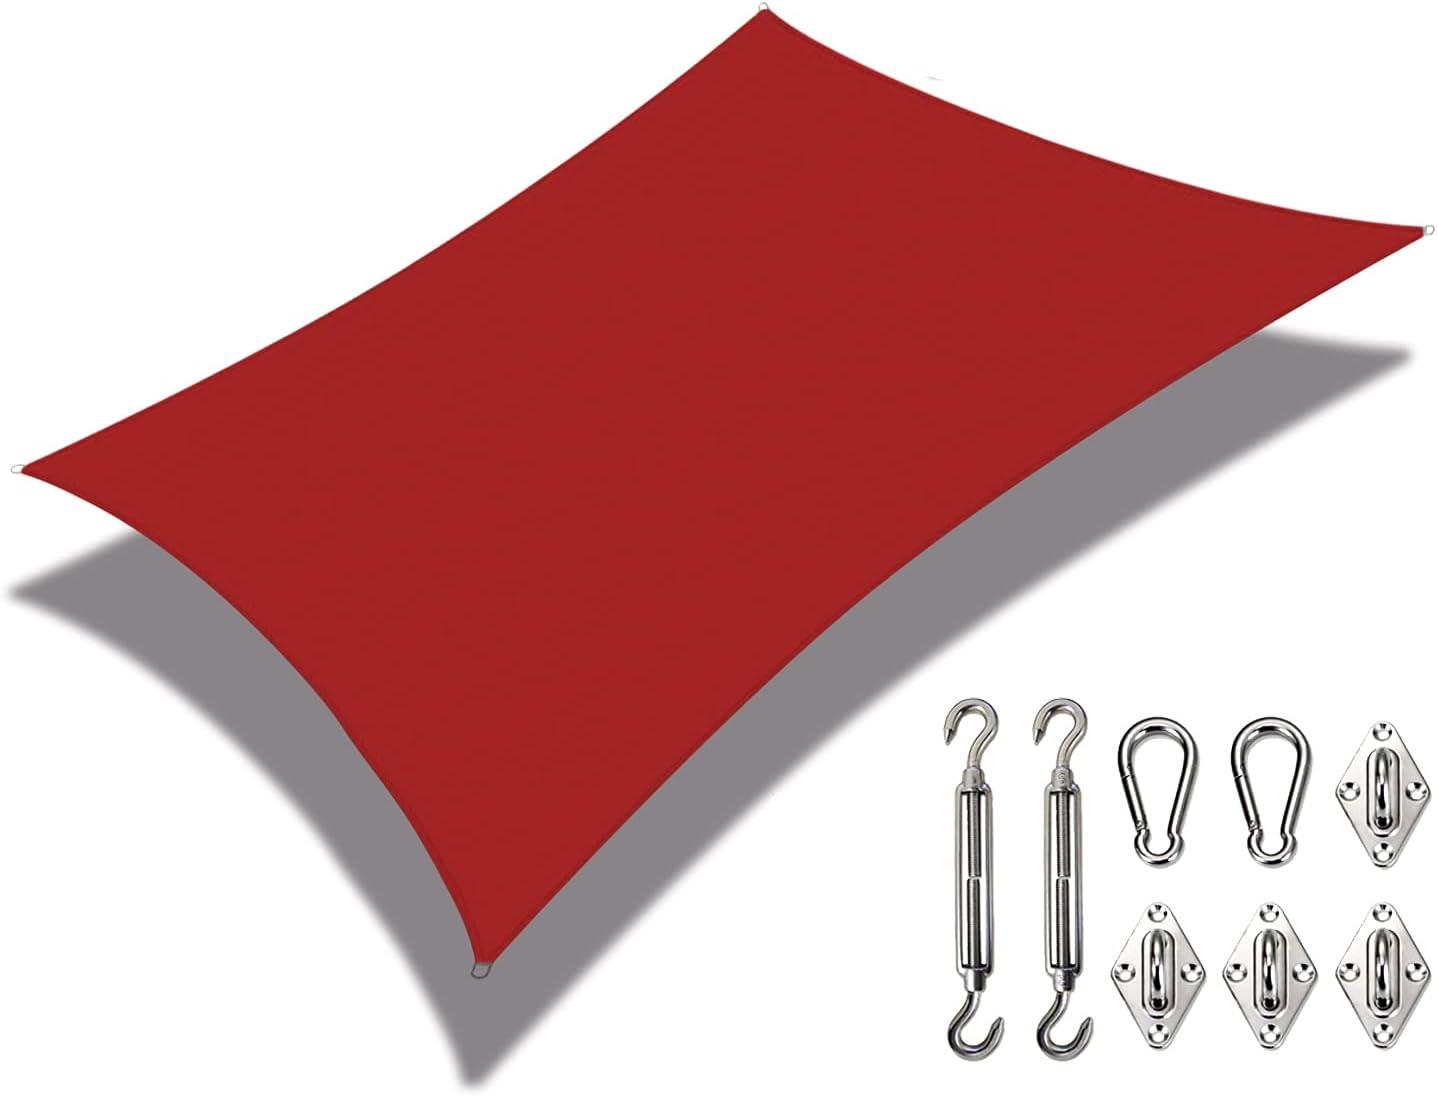 Coarbor Waterproof 5'x24' Customized Sun Came Atlanta Mall Max 40% OFF Shade Sail Canopy